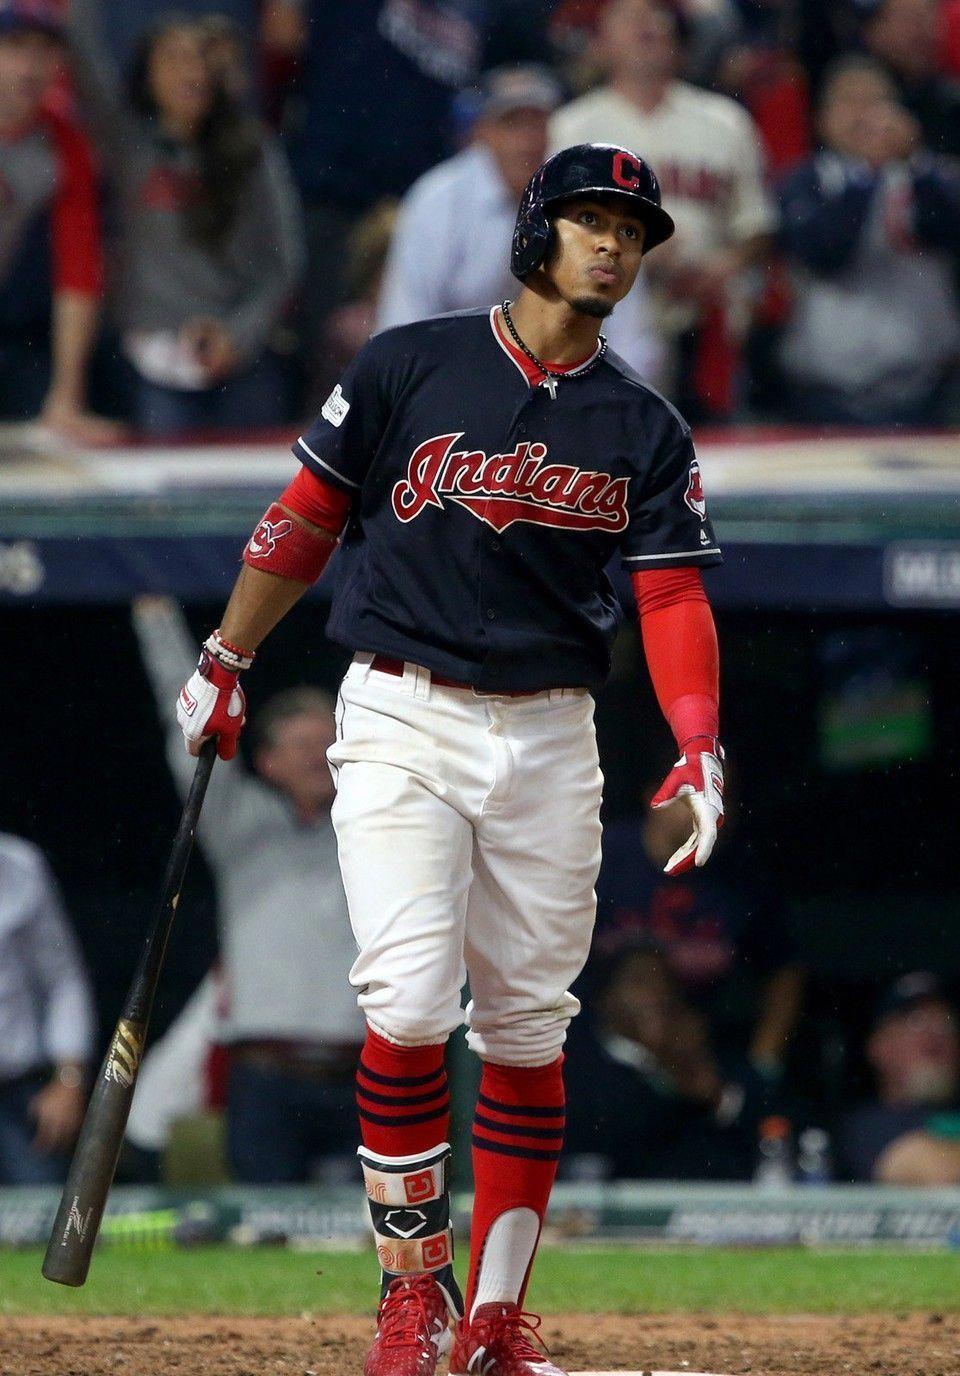 Pin By Natalia Lopez On Jihoon Baseball Player Au In 2020 Cleveland Indians Baseball Indians Baseball Atlanta Braves Game